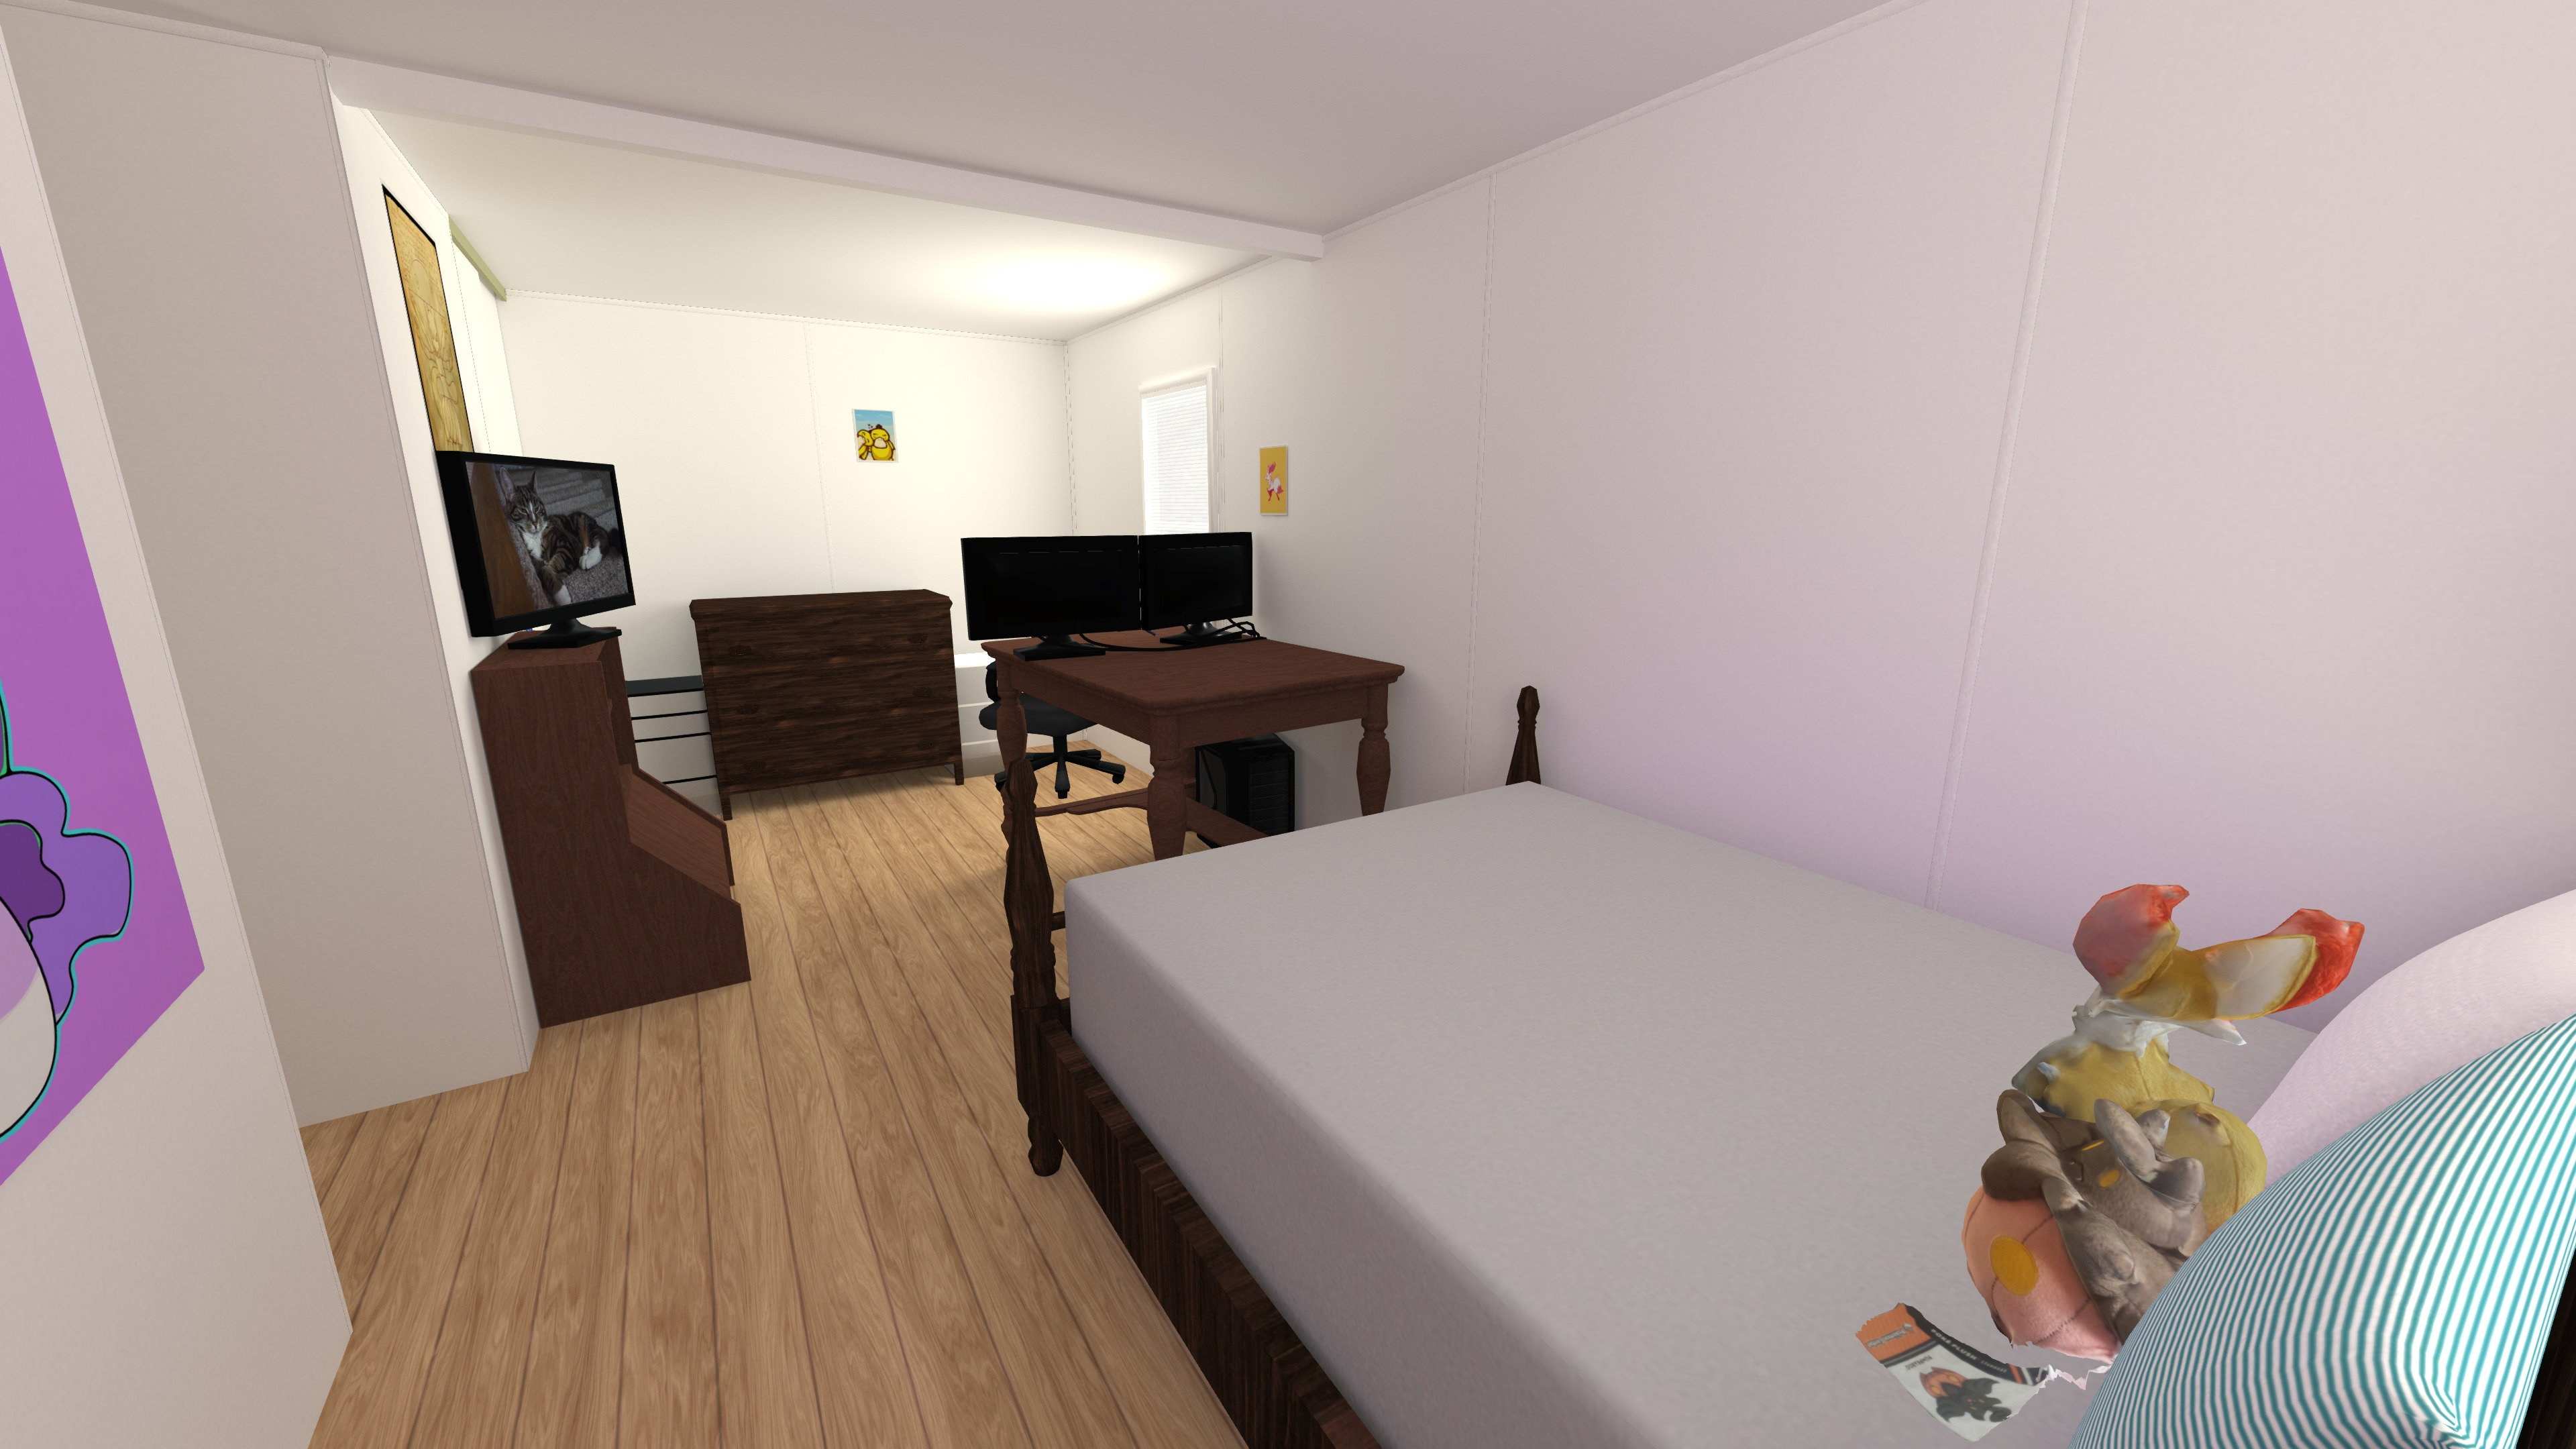 Bedroom bake